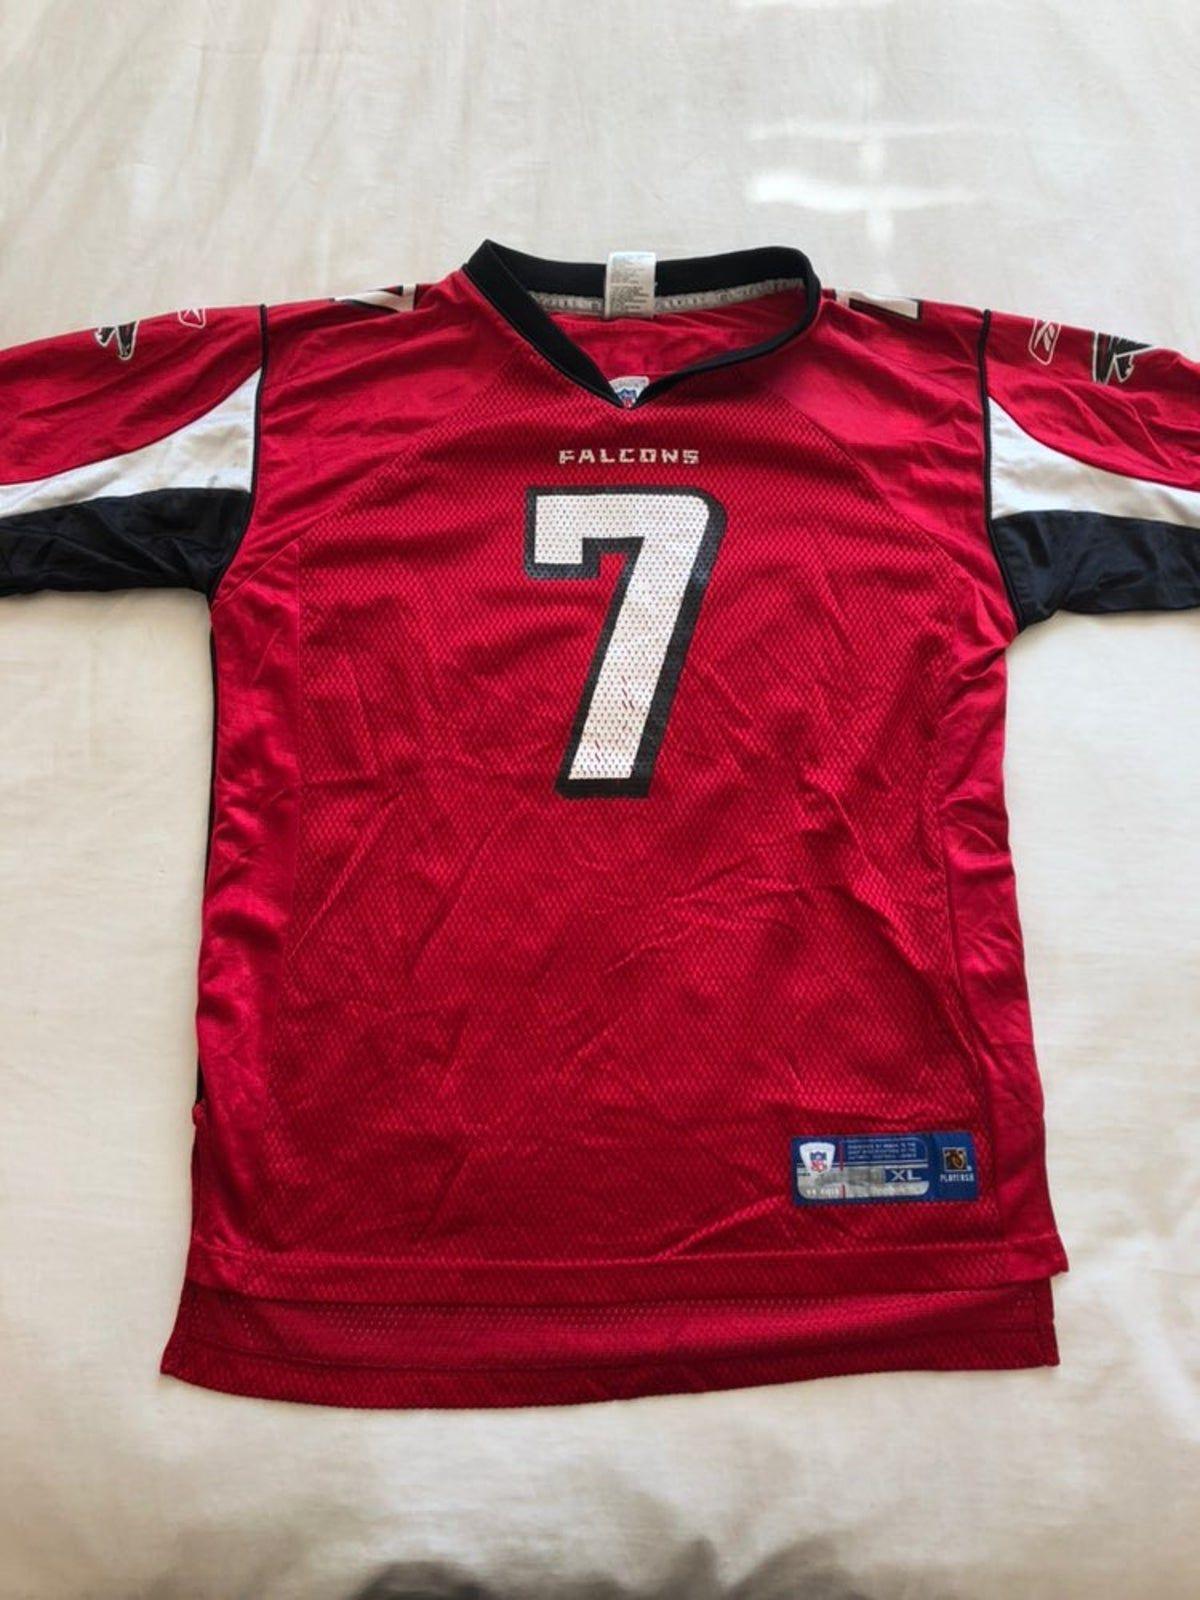 Vintage Michael Vick Atlanta Falcons 7 In 2020 Atlanta Falcons Michael Vick Falcons